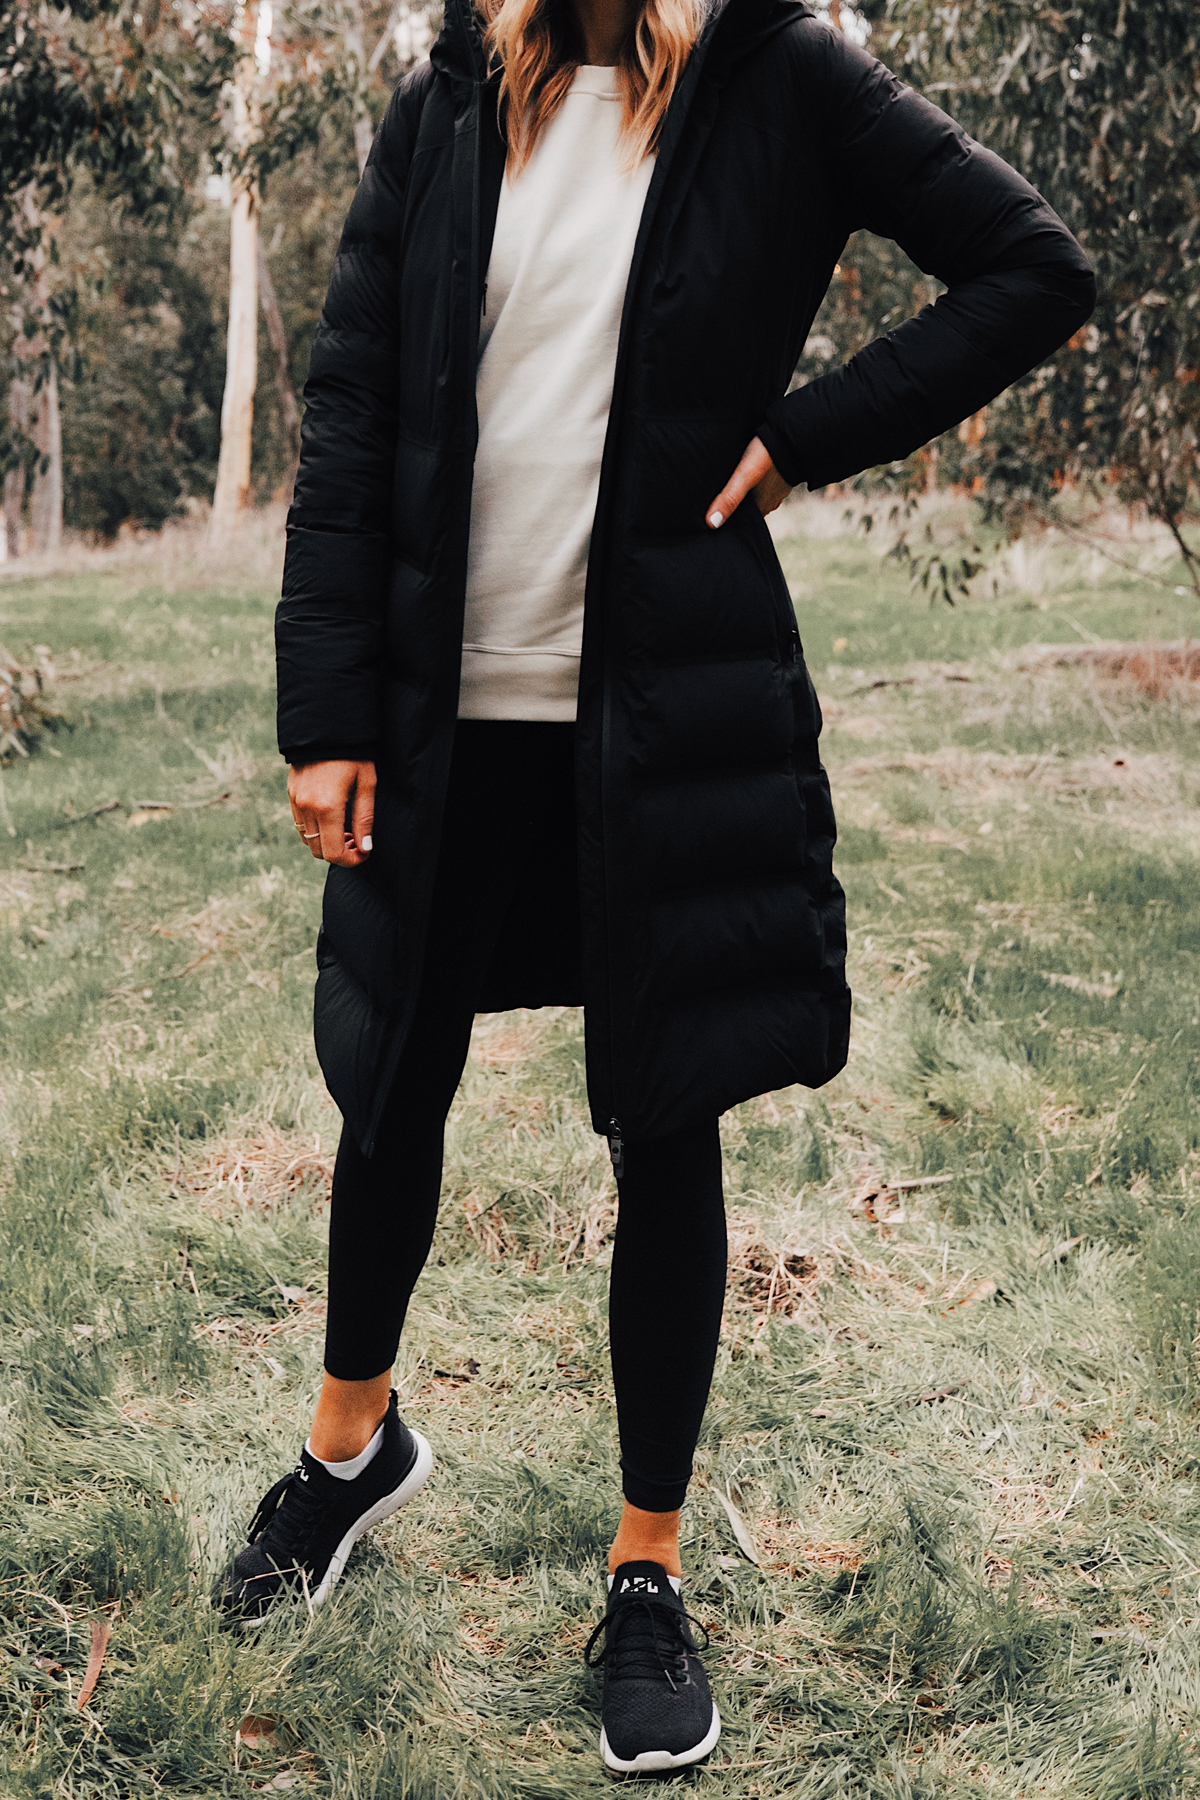 Fashion Jackson Wearing lululemon Black Sleet Street Long Jacket Black Beanie Black Leggings San Diego Hiking Trails